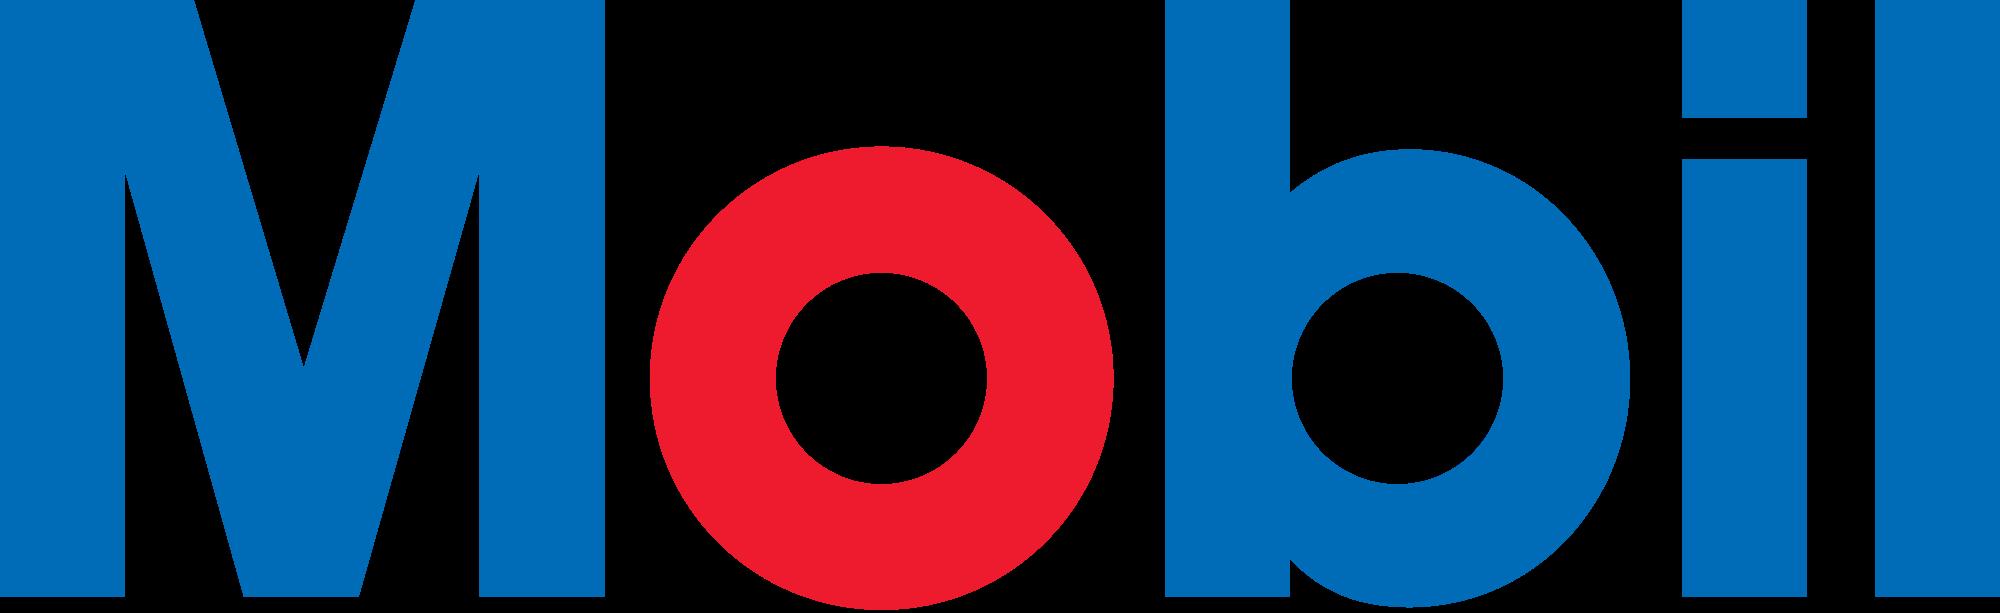 Mobil logo mobil symbol meaning history and evolution for Mobile logo